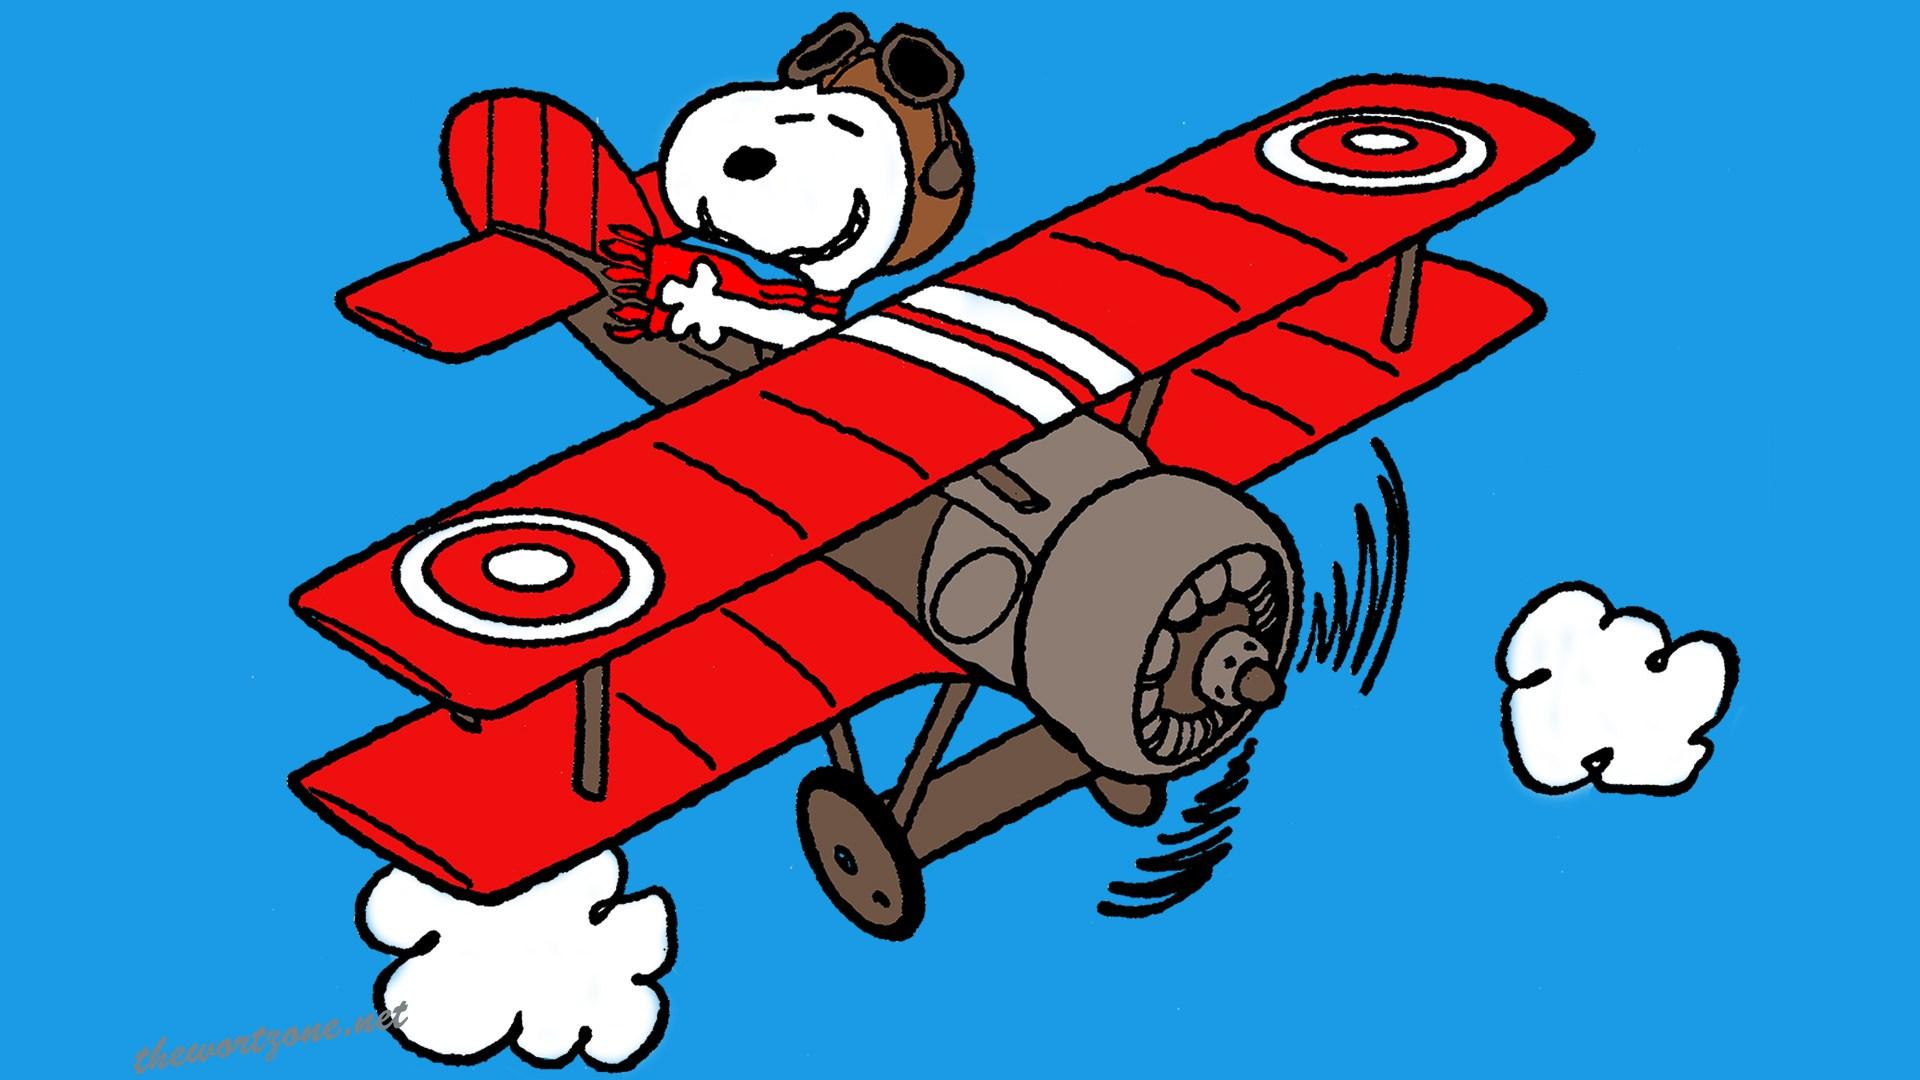 Snoopy Sopwith Camel Red Baron